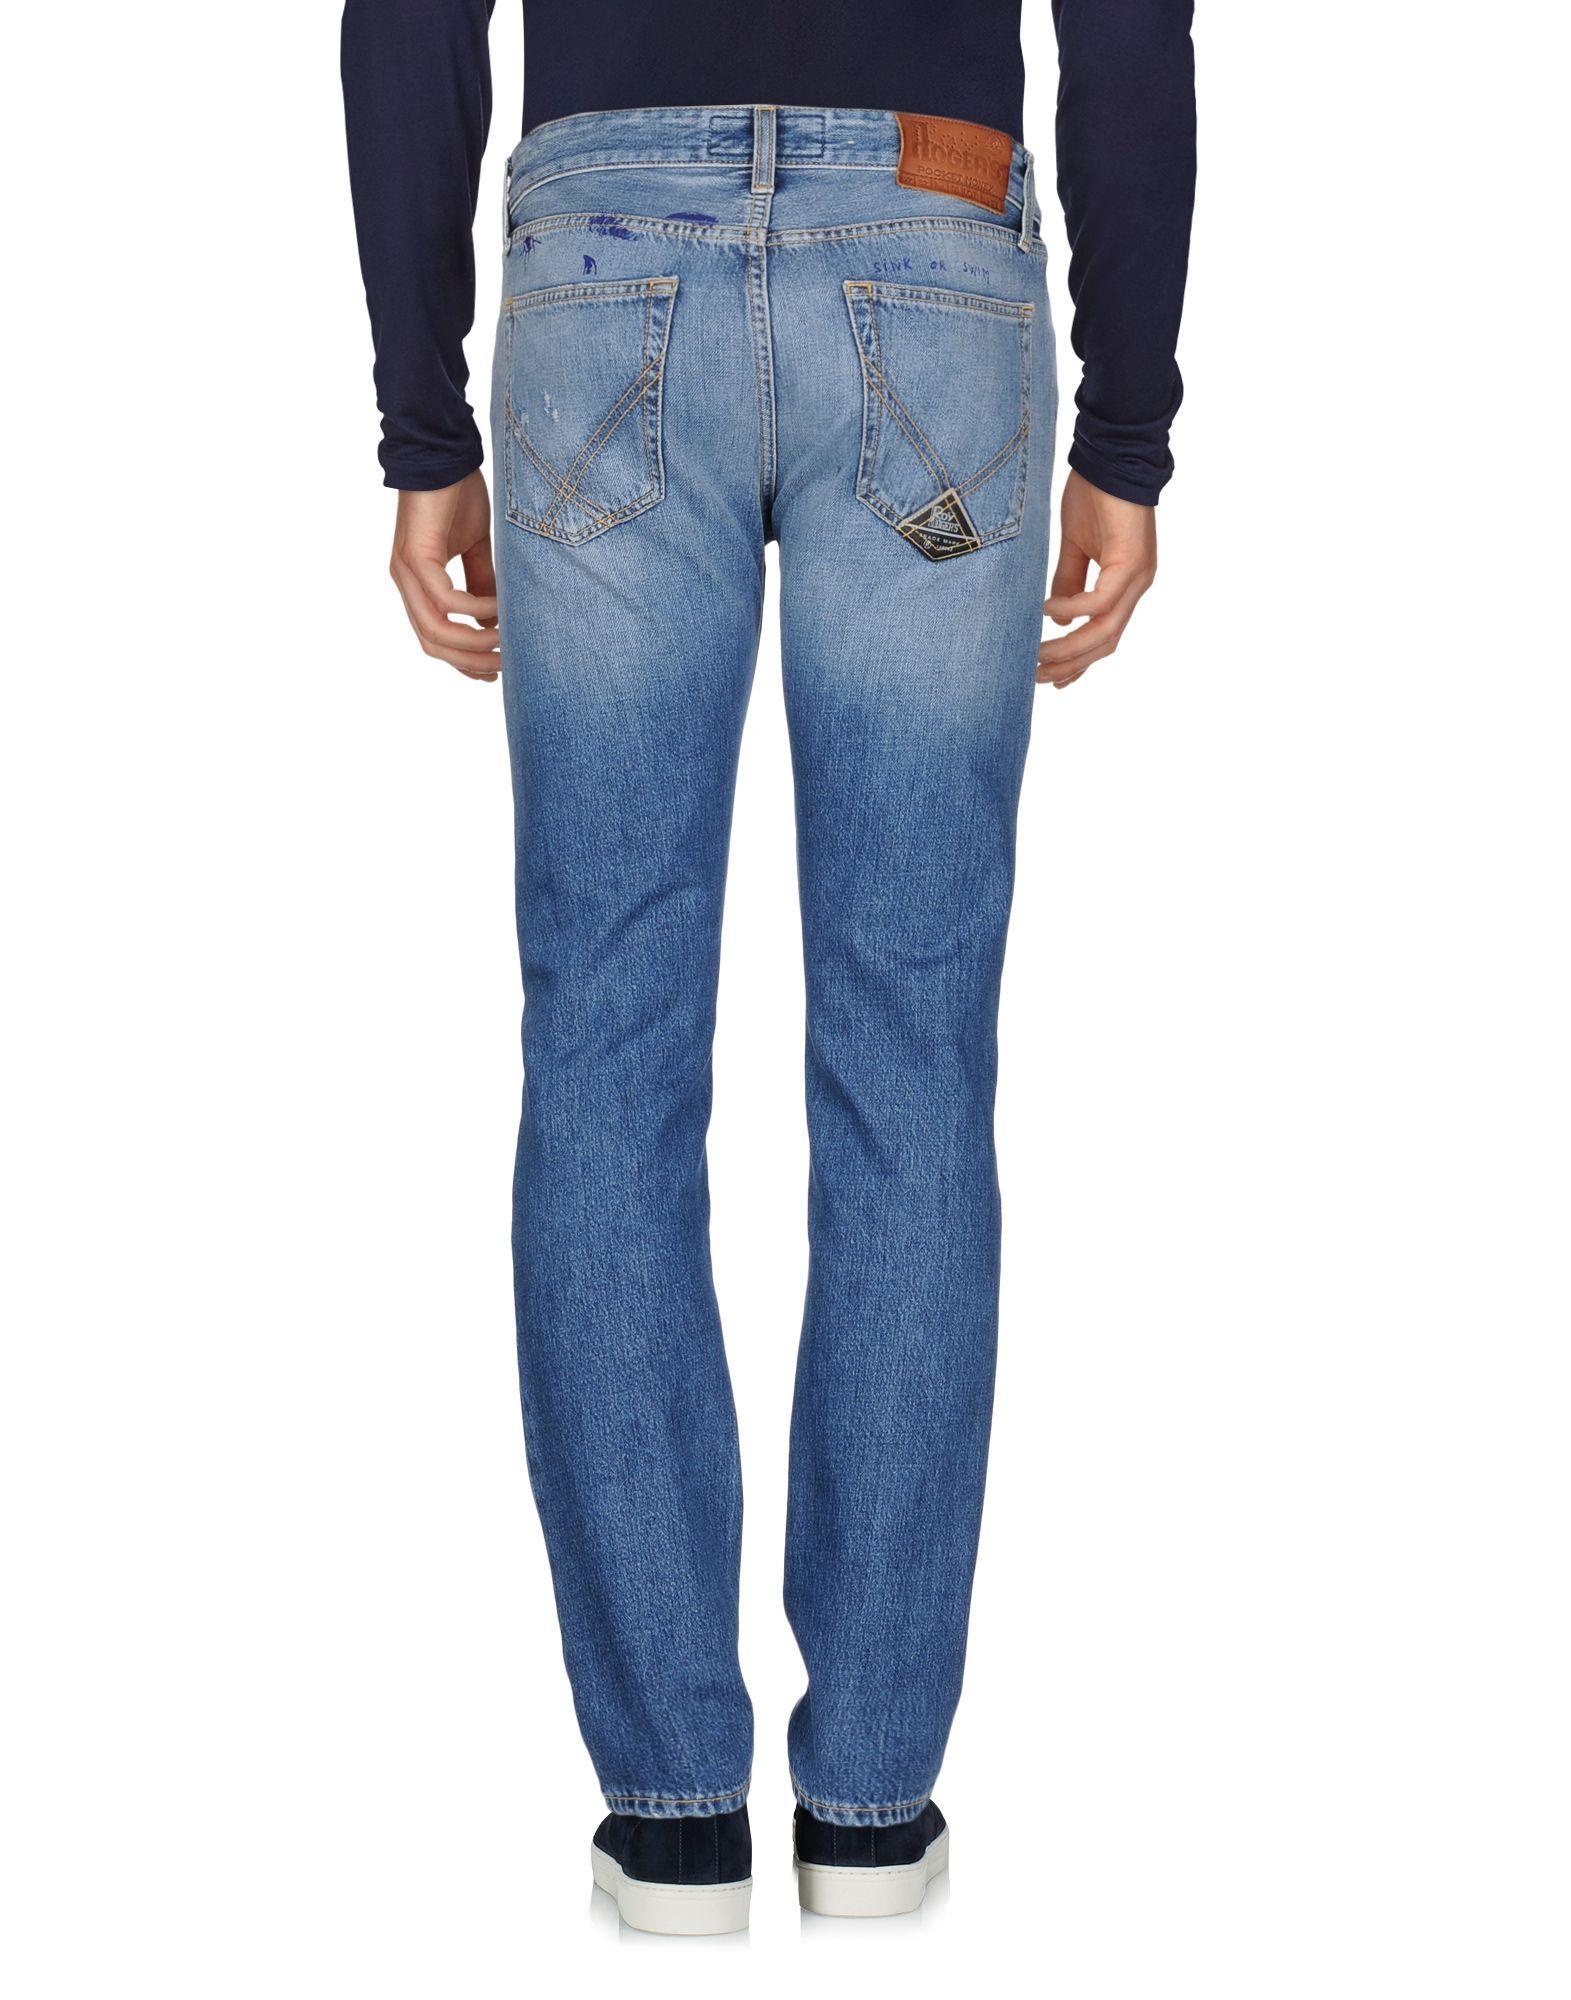 Roÿ Roger'S Blue Cotton Straight Leg Jeans